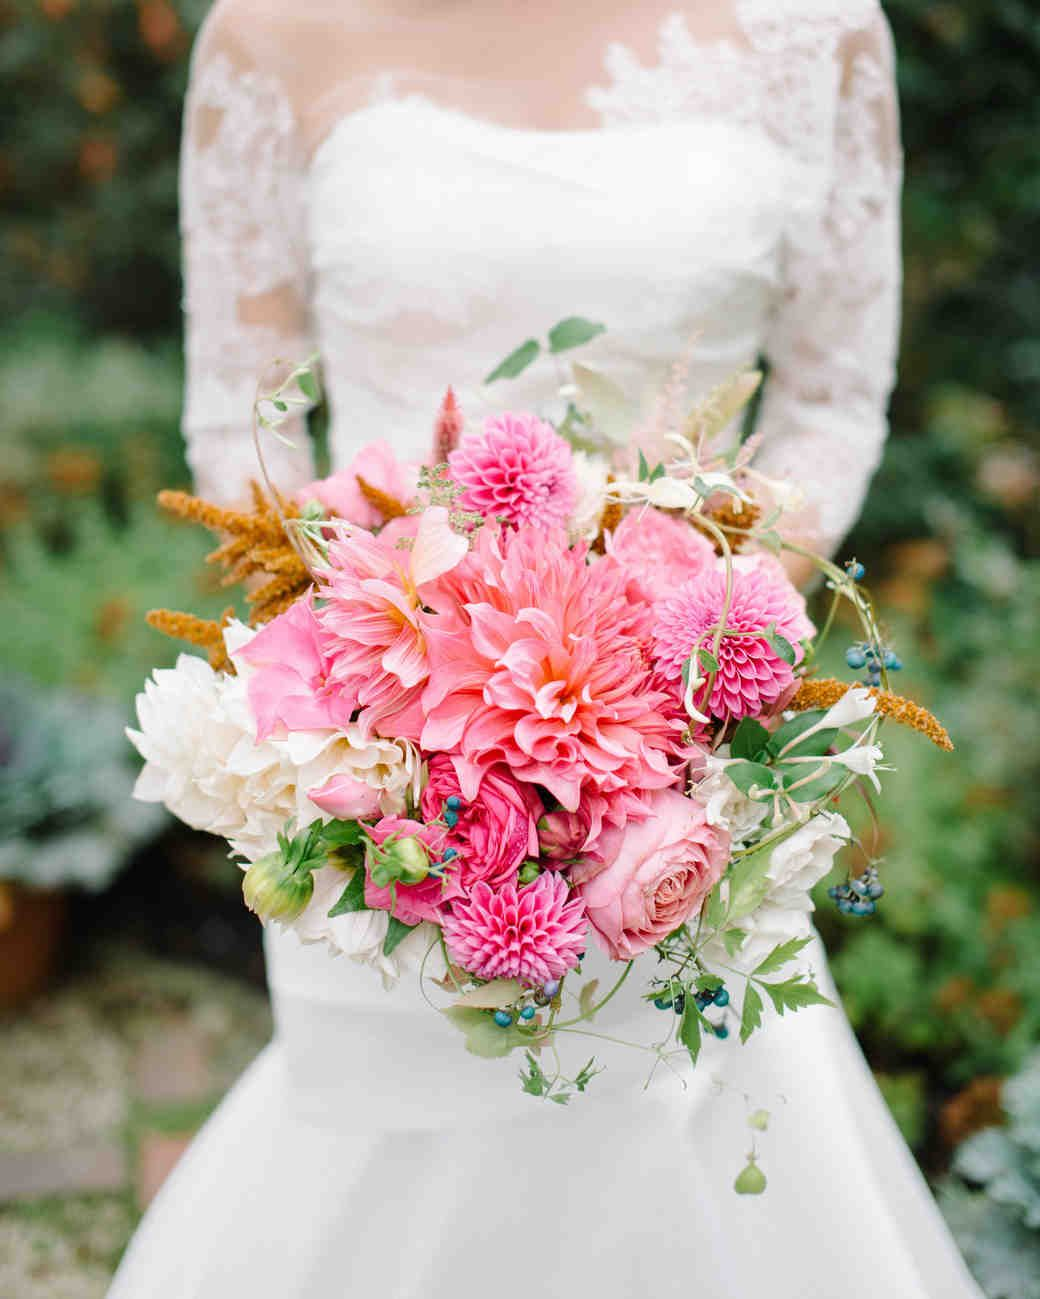 Pink Dahlia Wedding Bouquet Dahlia Wedding Bouquets Dahlias Wedding Wedding Bouquets Pink